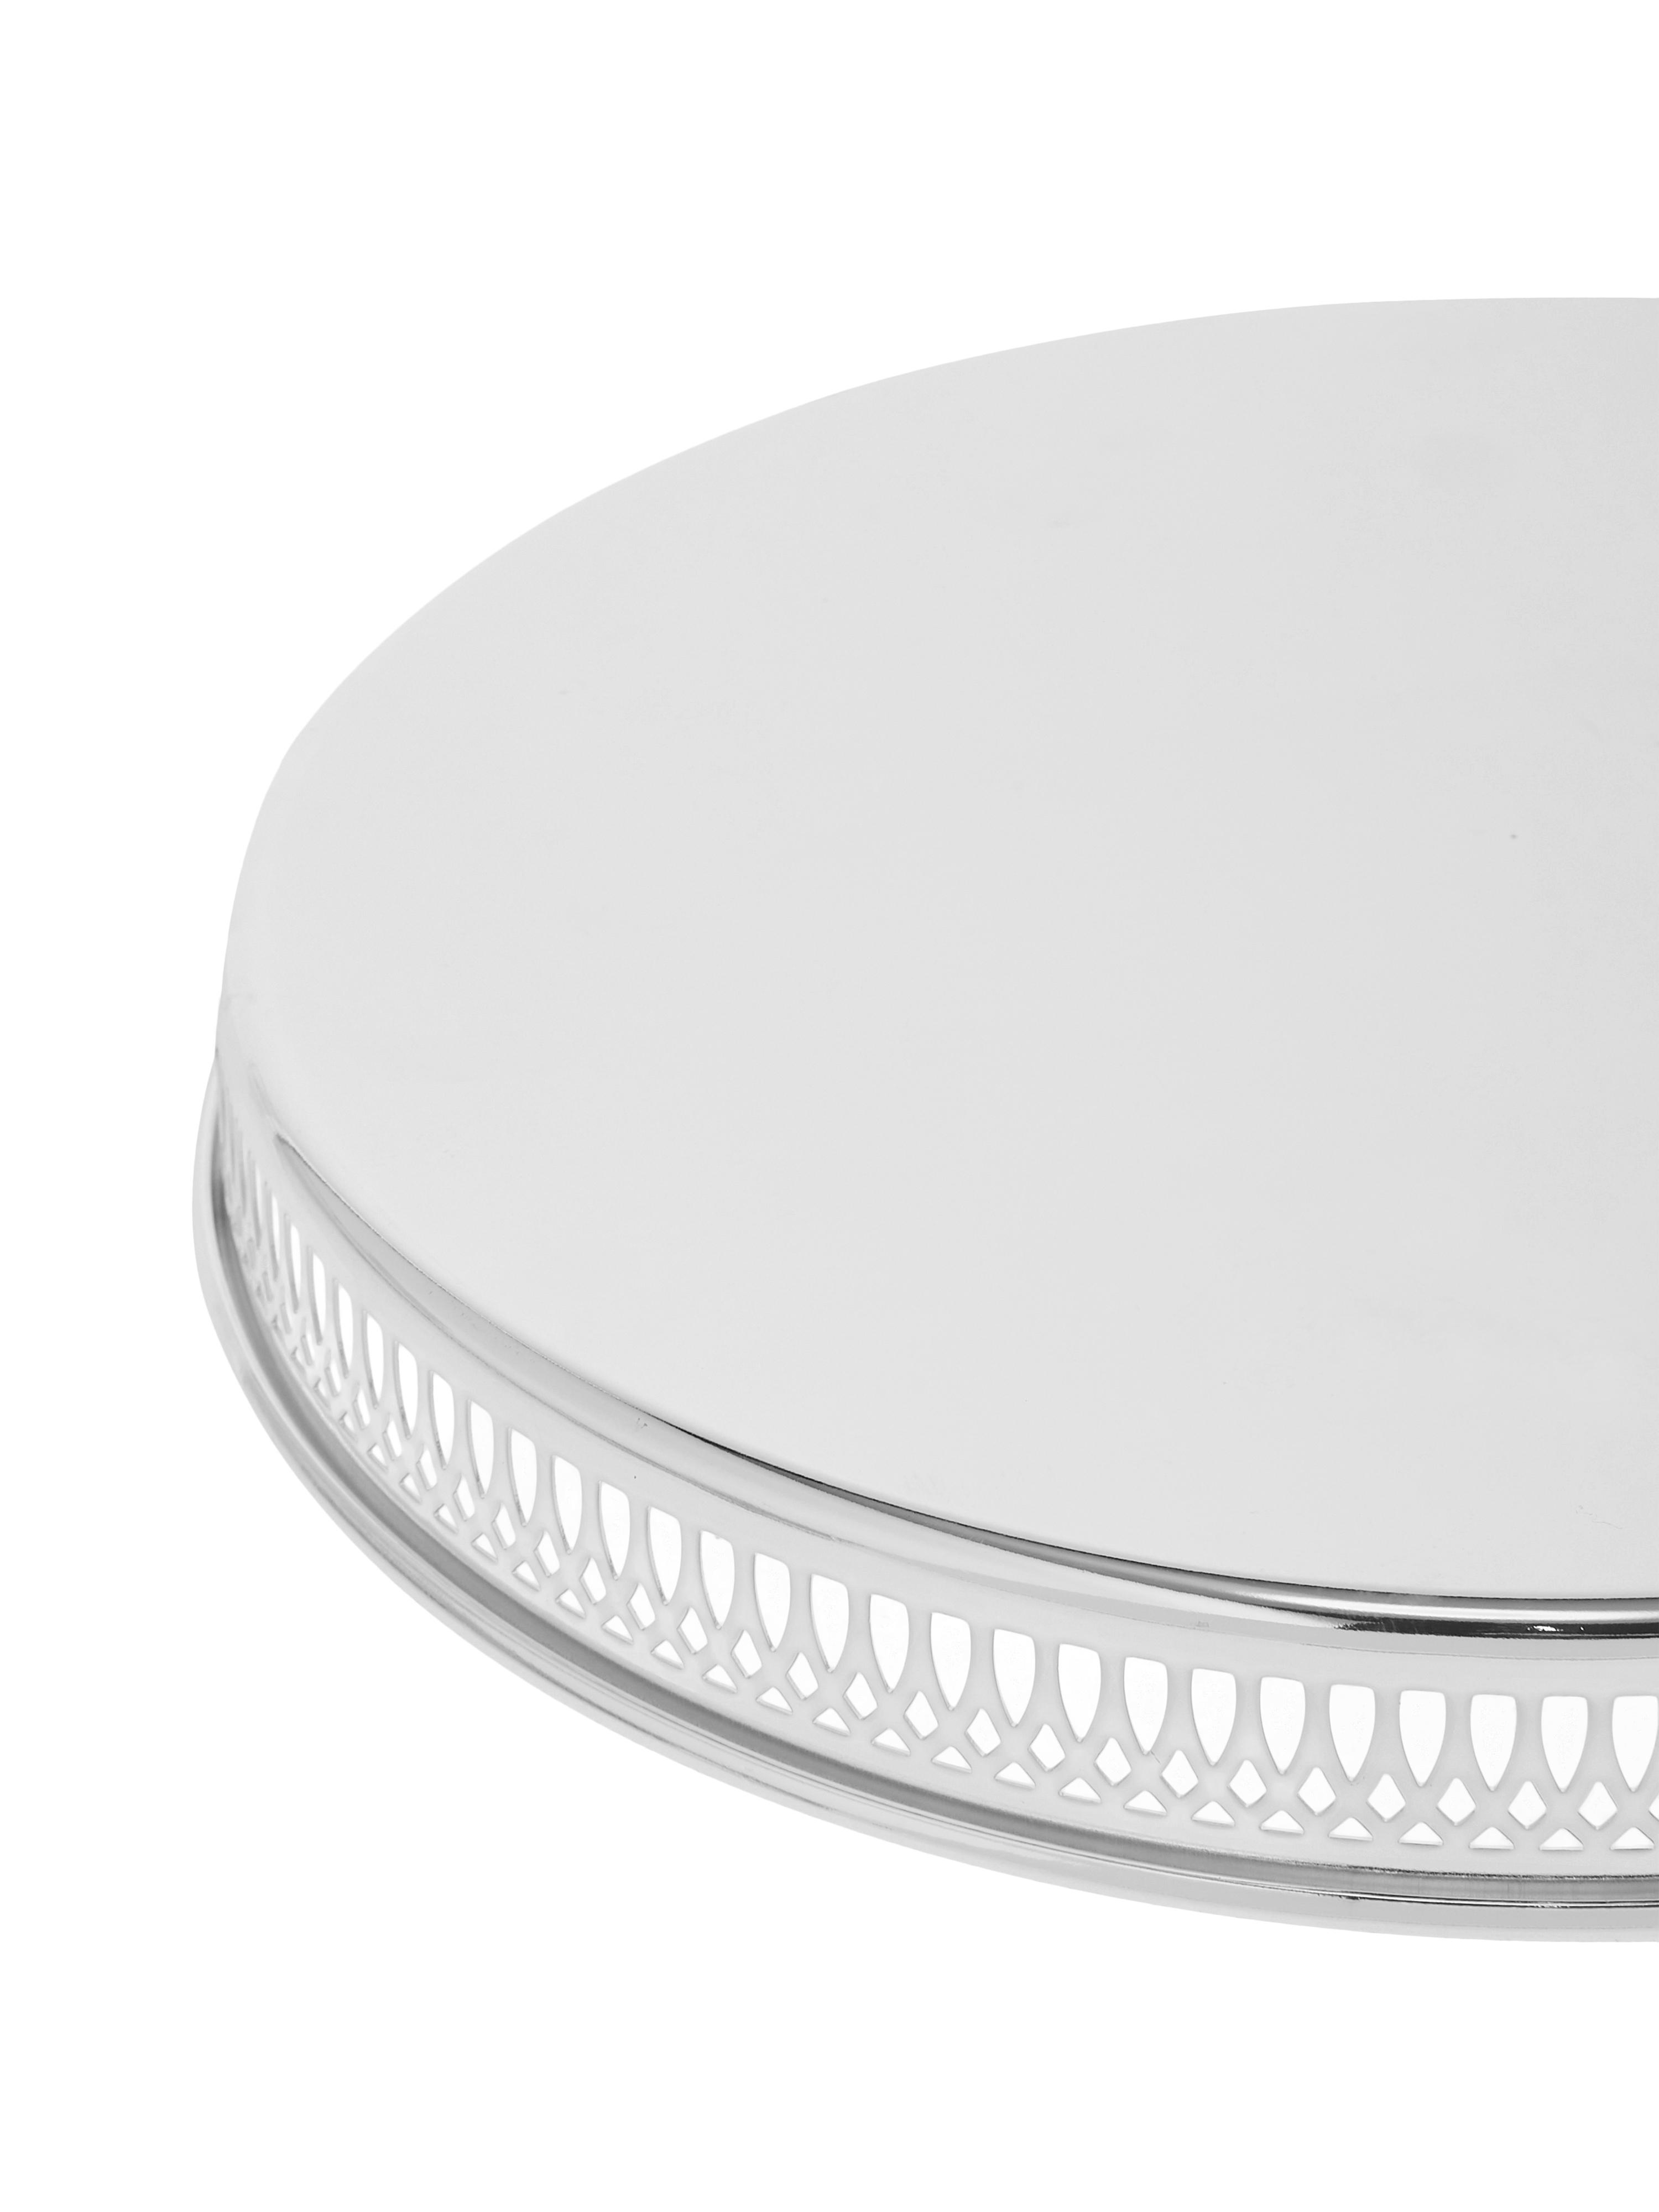 Vassoio rotondo per specchi Delphi, Acciaio argentato, Argento, Ø 30 cm